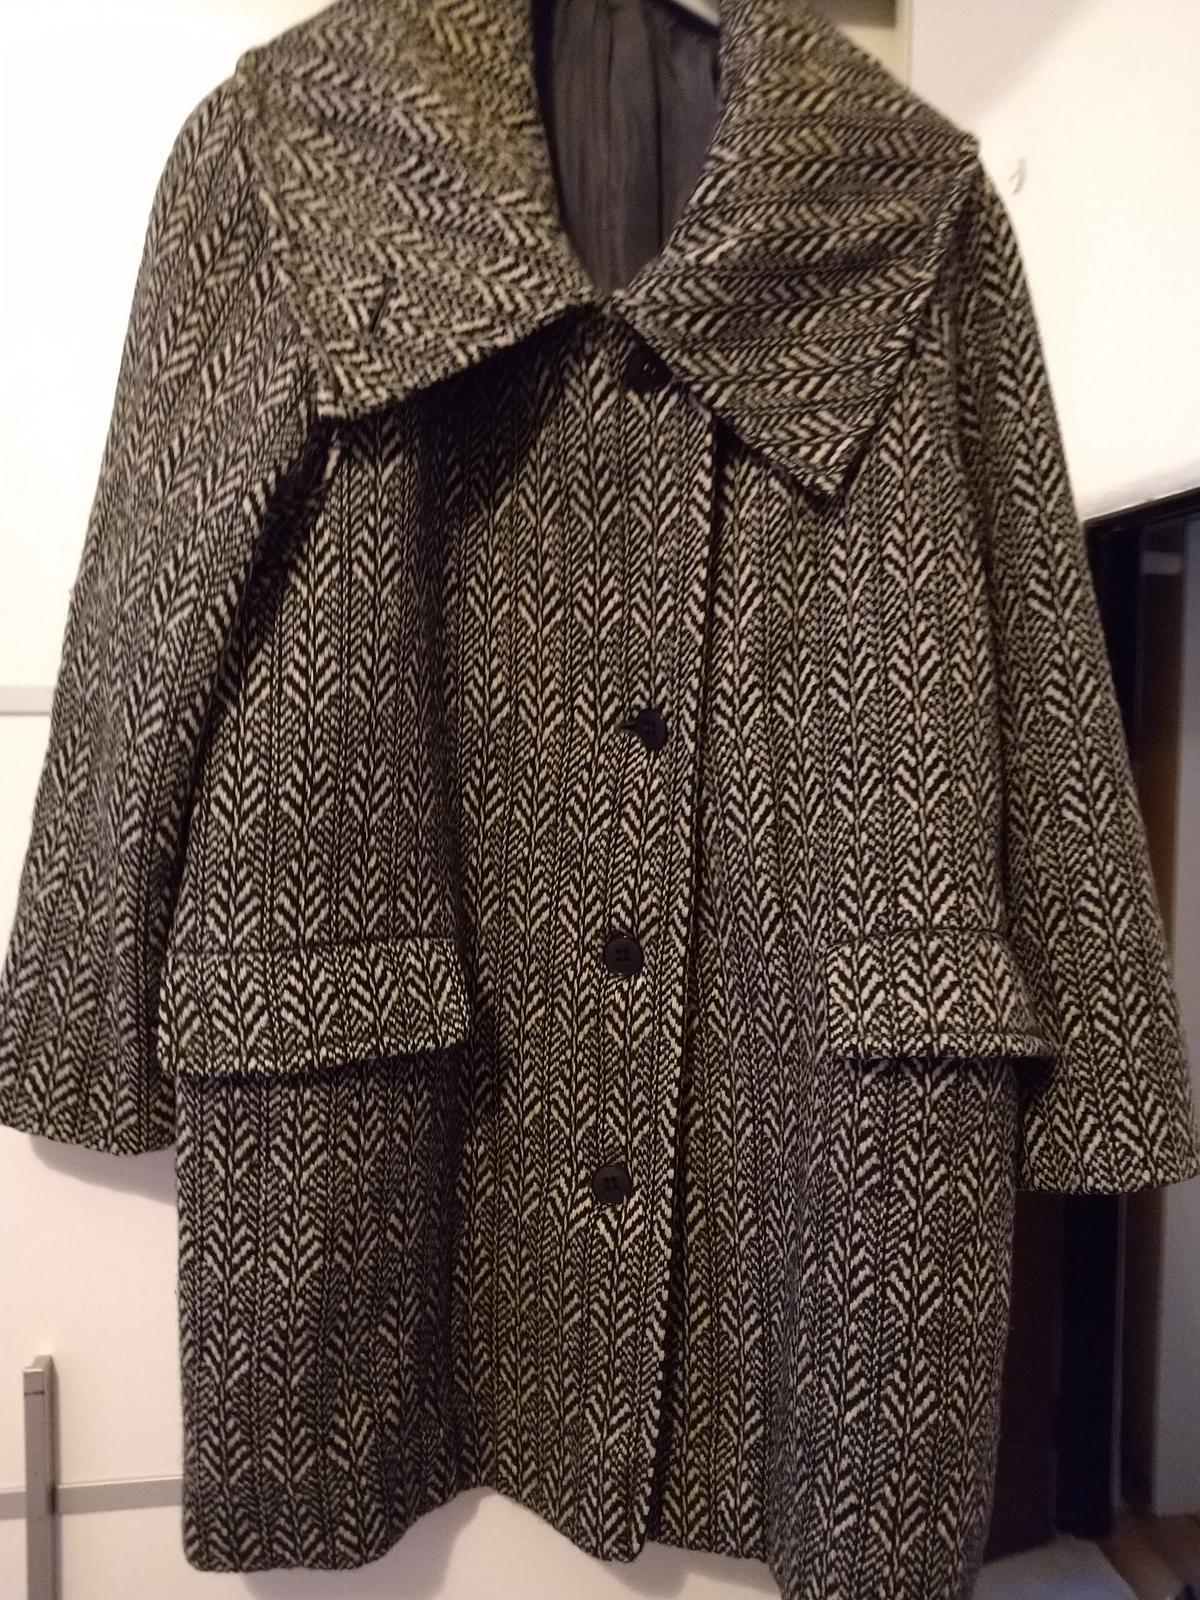 Čiernobiely kabát c.50 - Obrázok č. 3